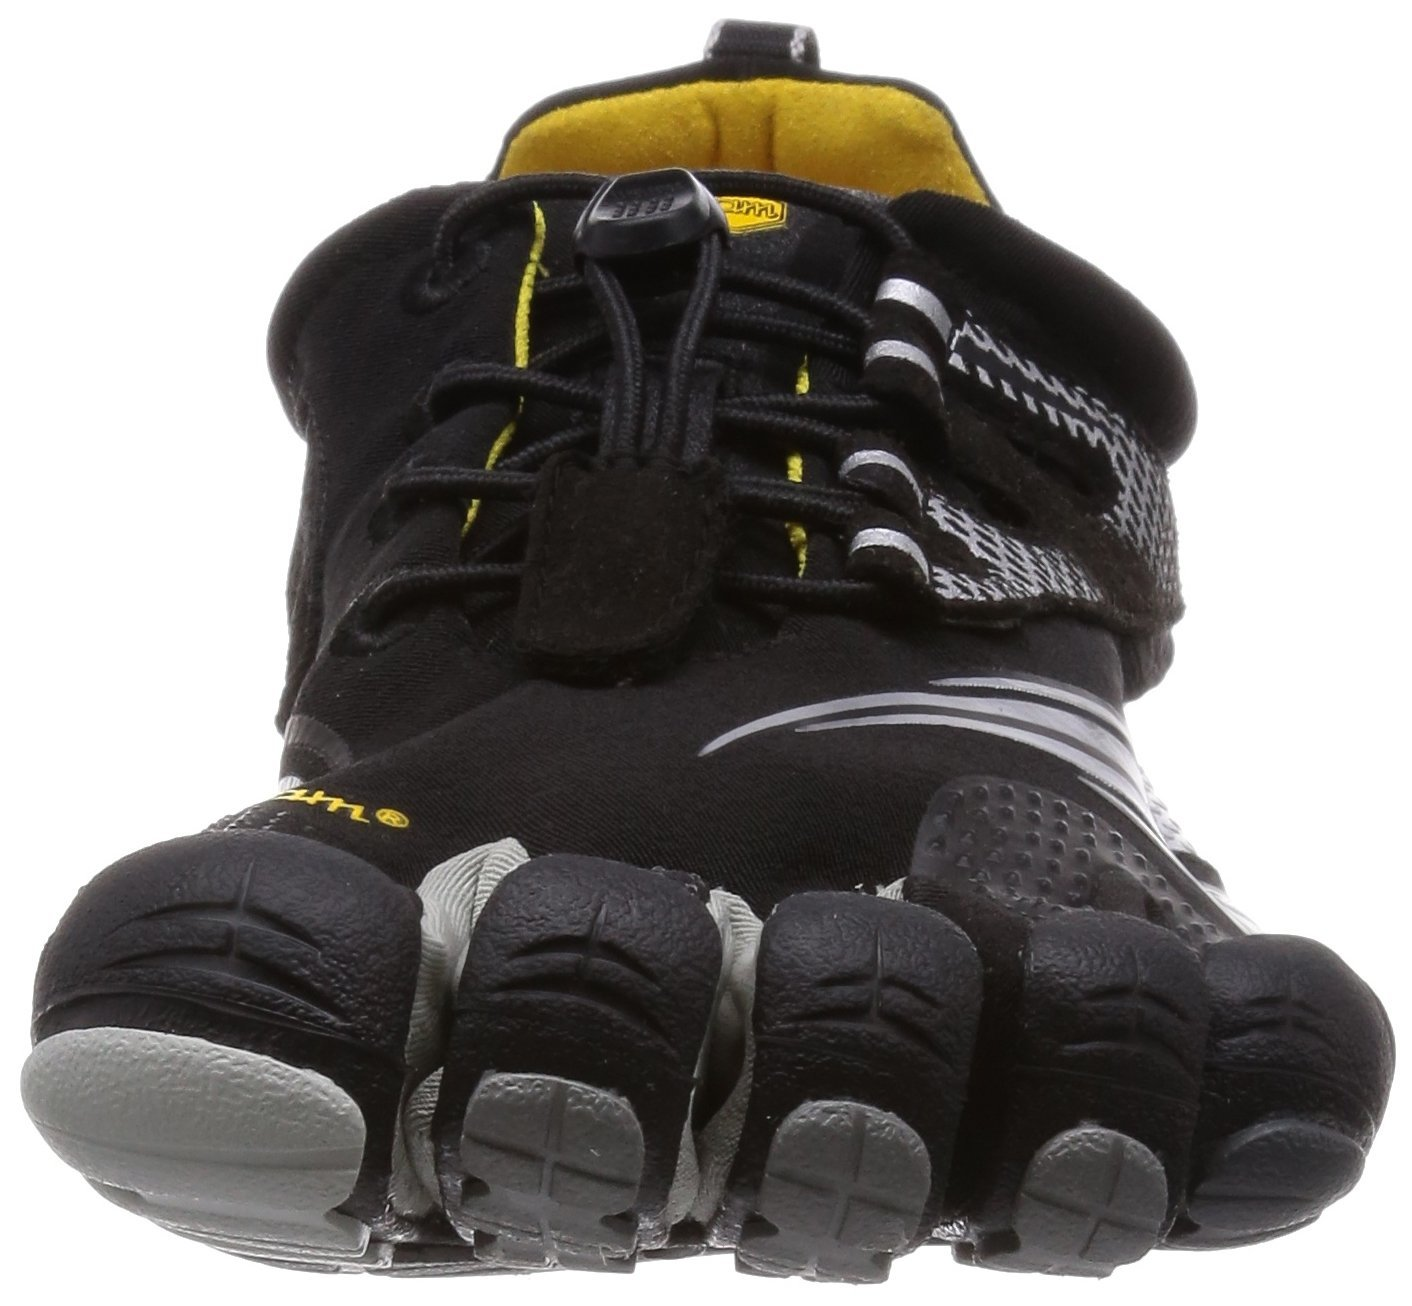 Vibram Women S Kmd Ls Cross Training Shoe